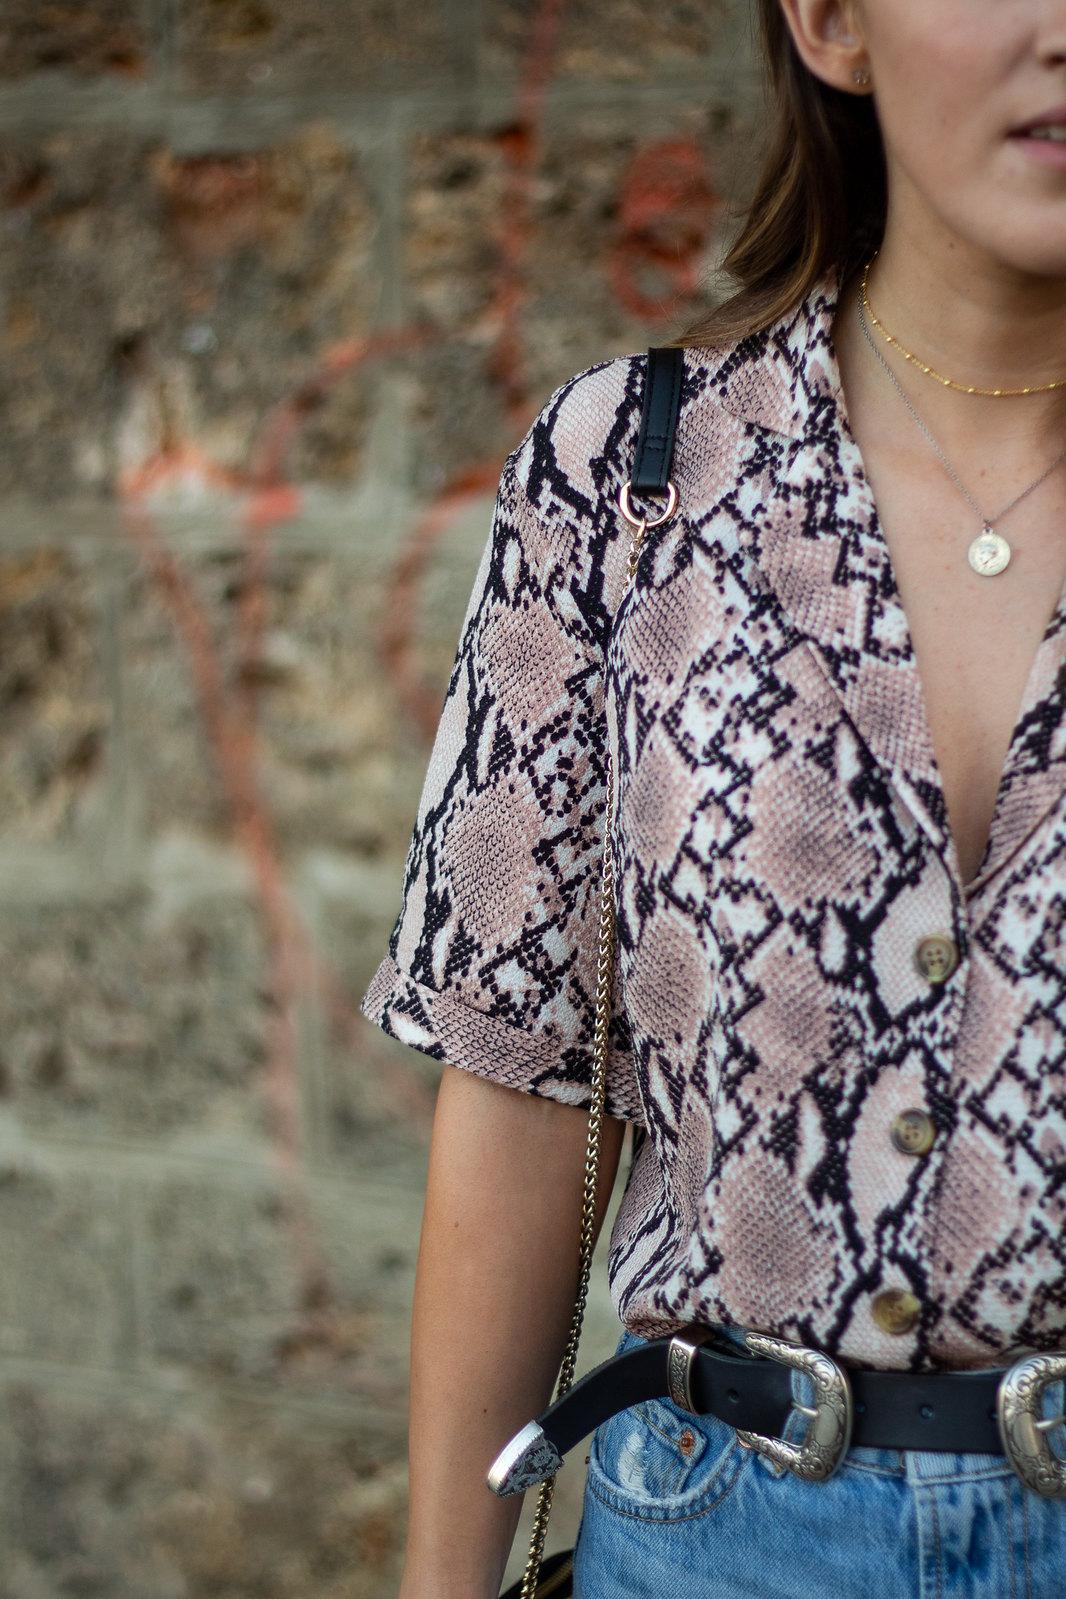 snake skin shirt-13